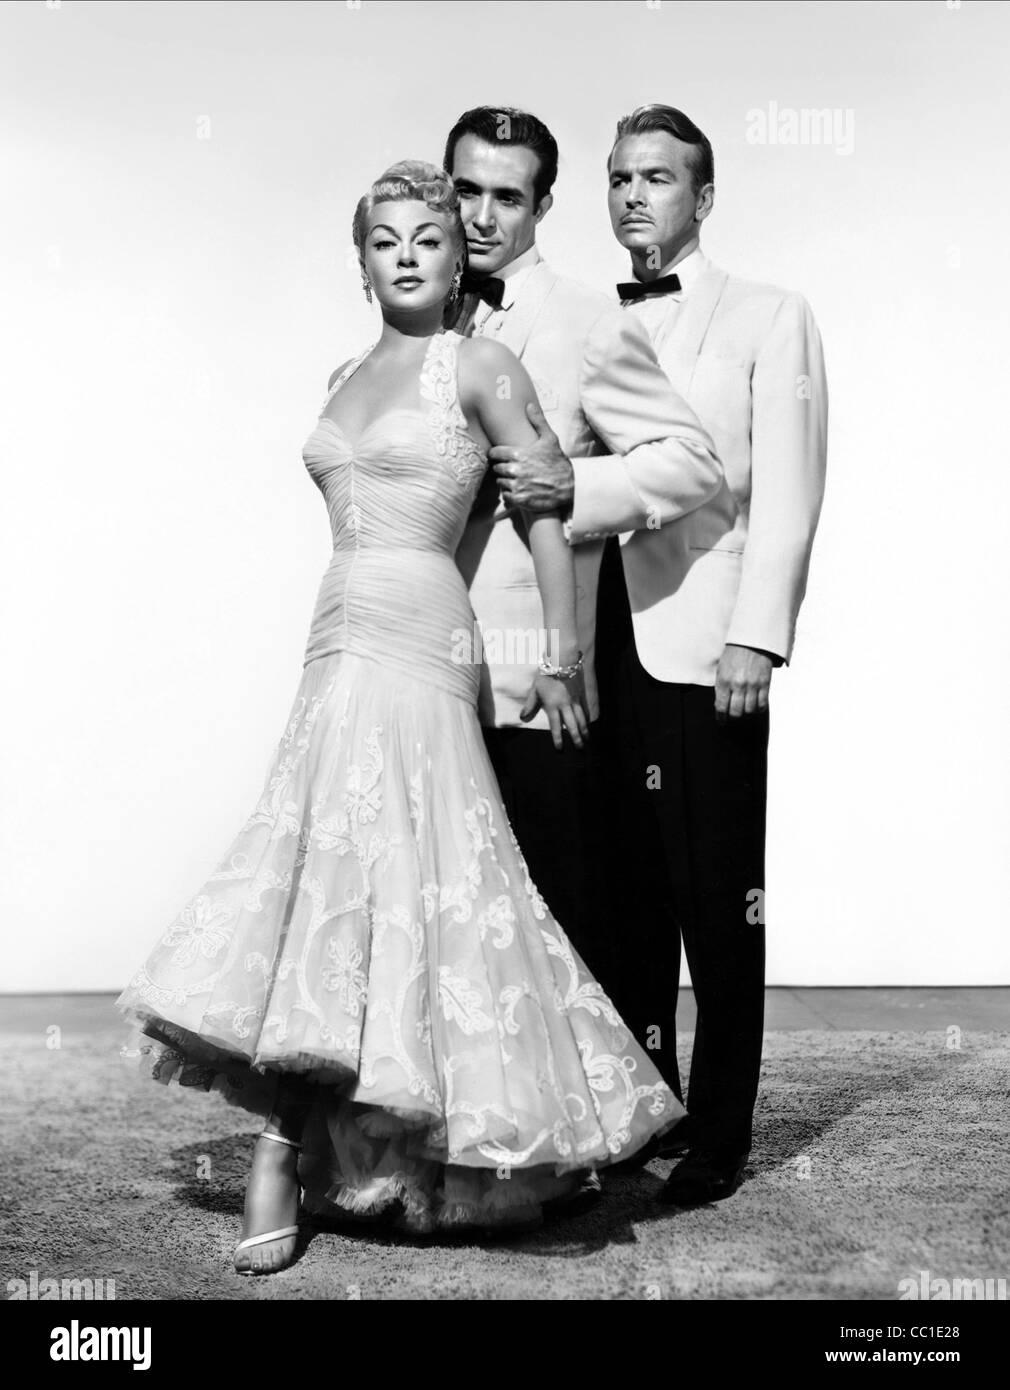 LANA TURNER RICARDO MONTALBAN & JOHN LUND LATIN LOVERS (1953) Stockbild